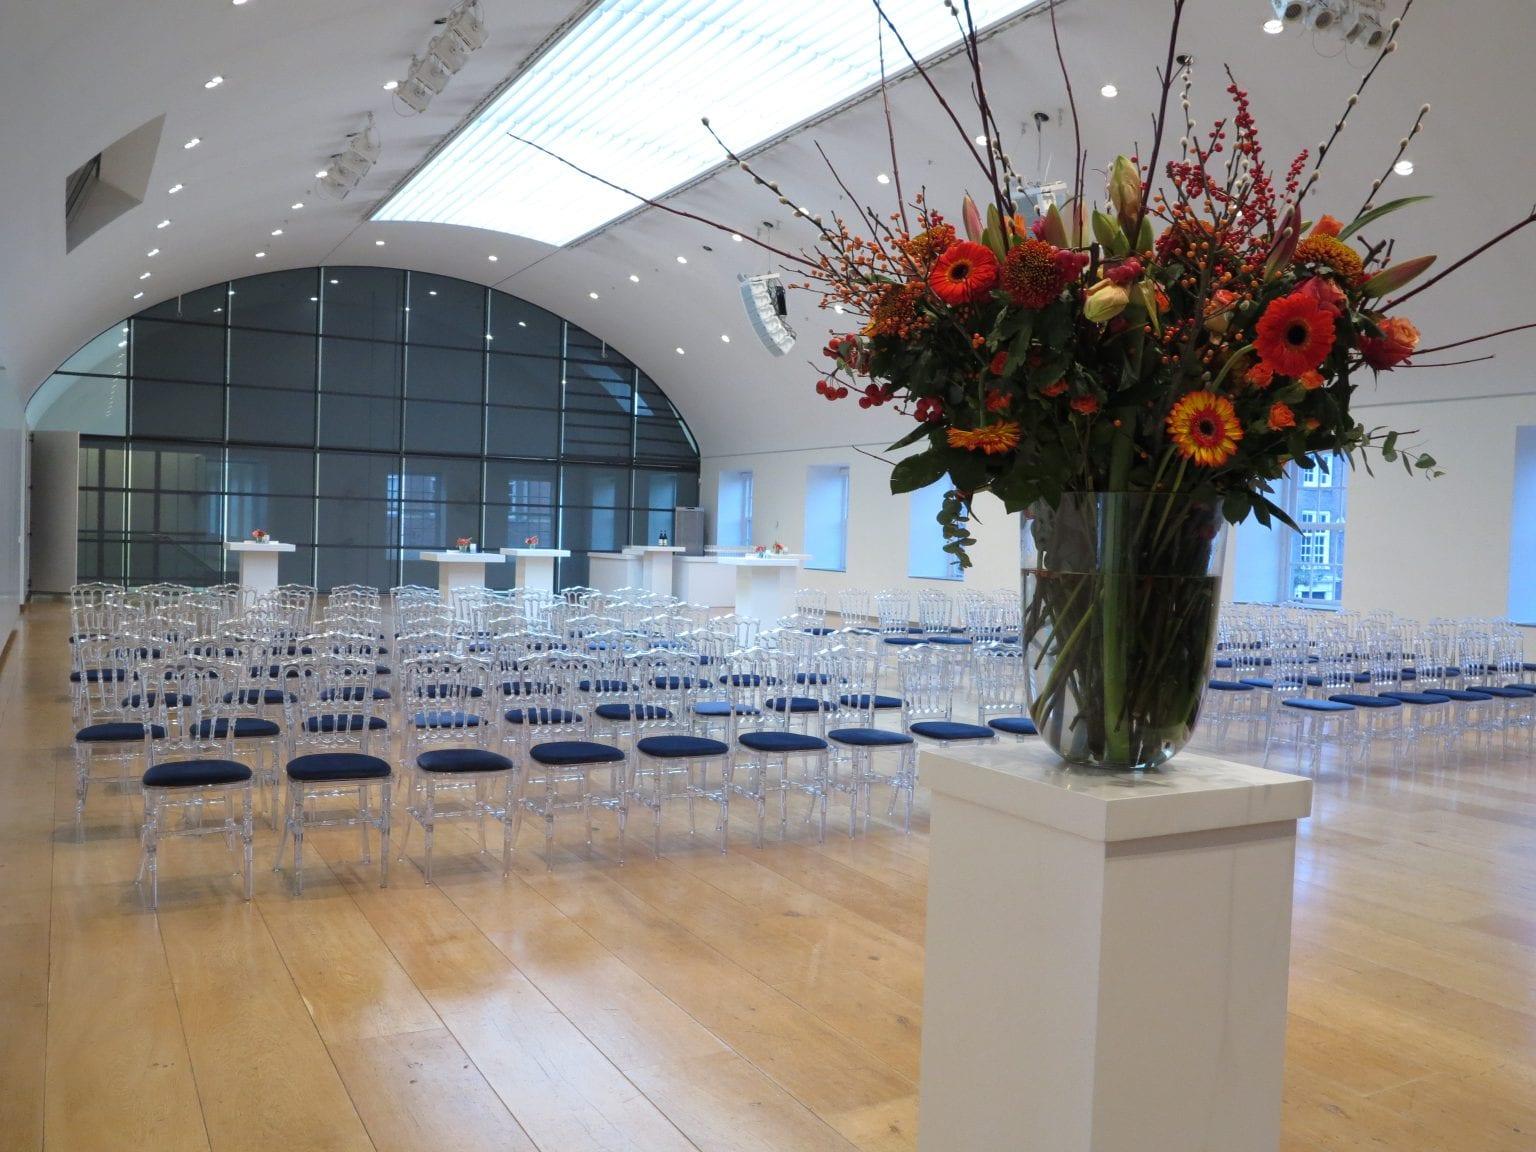 Auditorium-Foto Renee Koudstaal